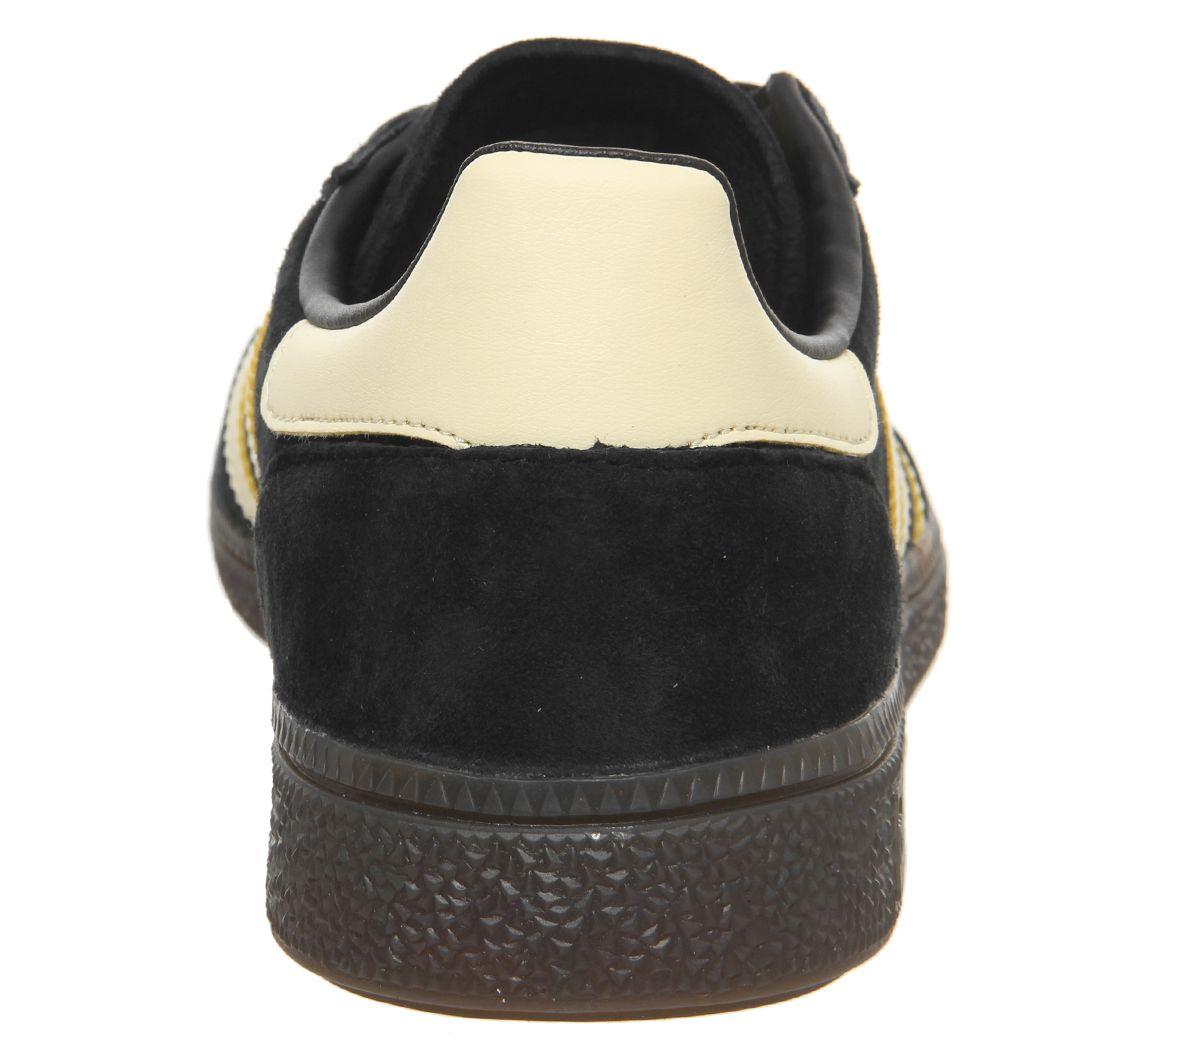 Adidas Scarpe ginnastica Easy Yellow Handball Core Shoeseac5d28c1f1511d513db14f24eb56870 da Spezial Gum Black F3uTK1lJc